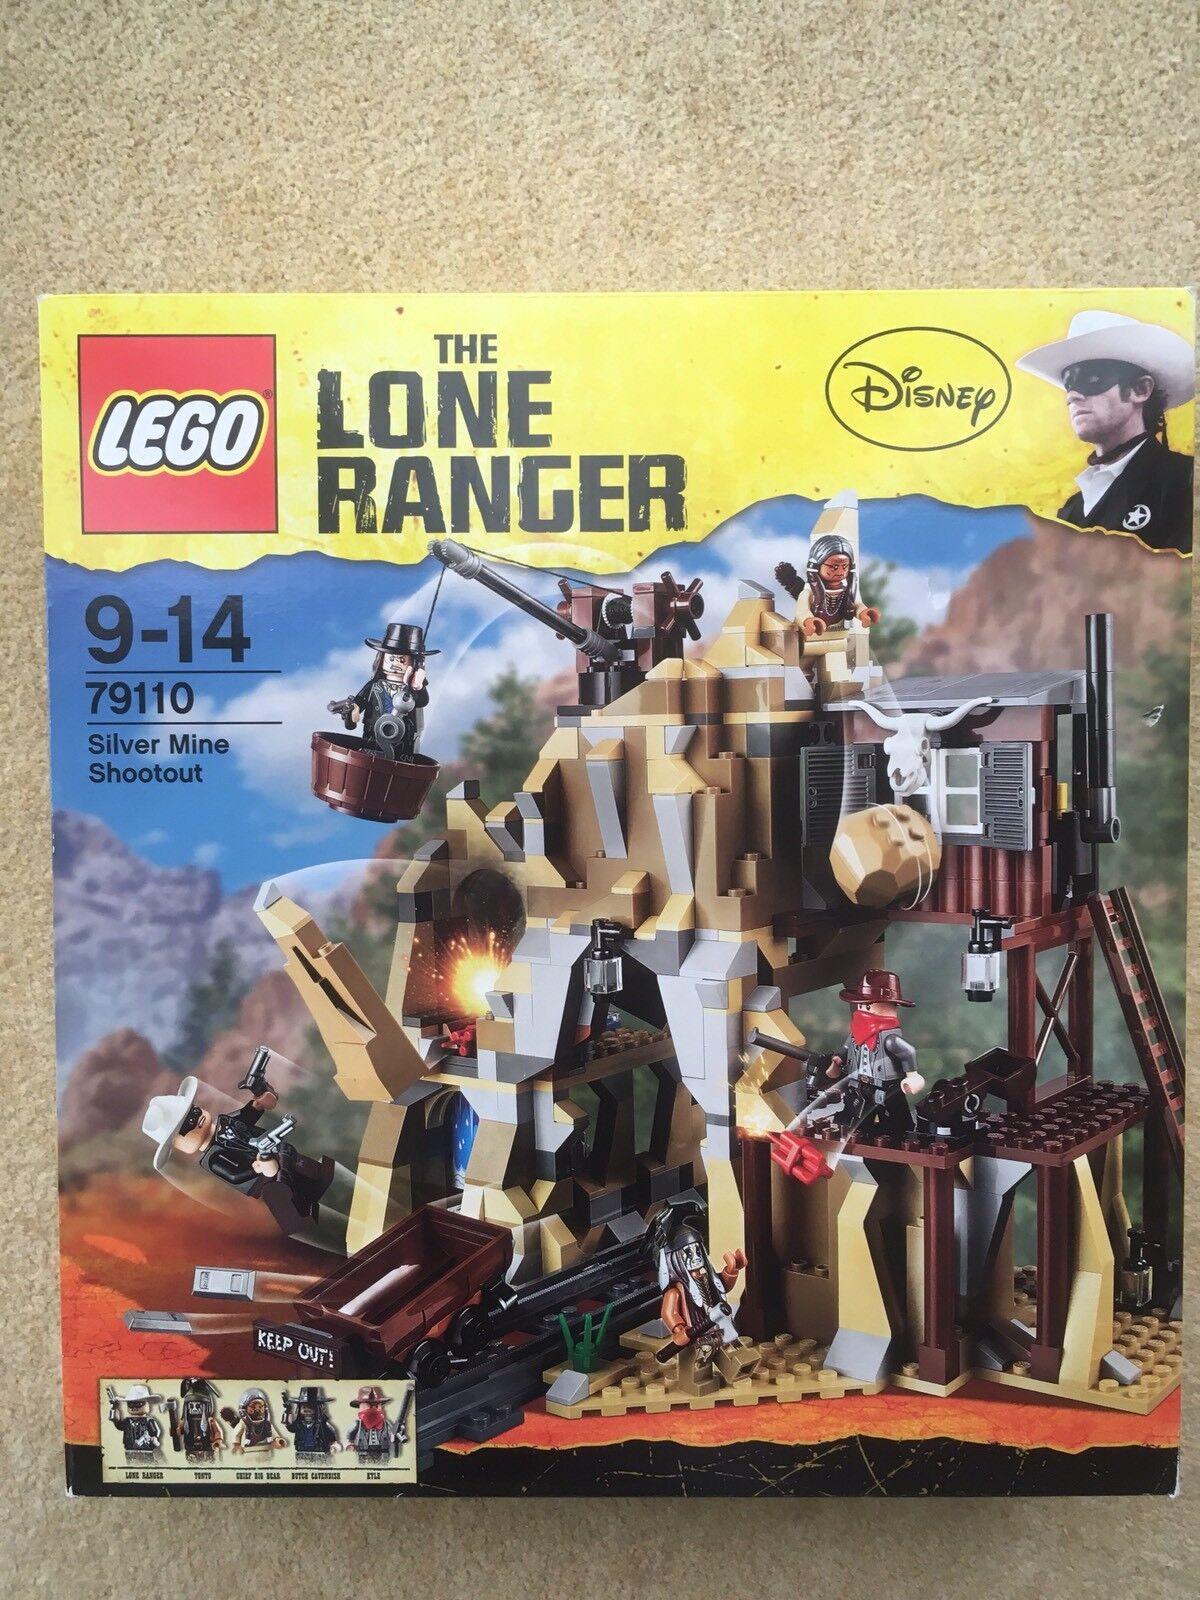 LEGO LONE RANGER 79110-Miniera d'argentoo  sparatoria-BNISB - 2013  buon prezzo